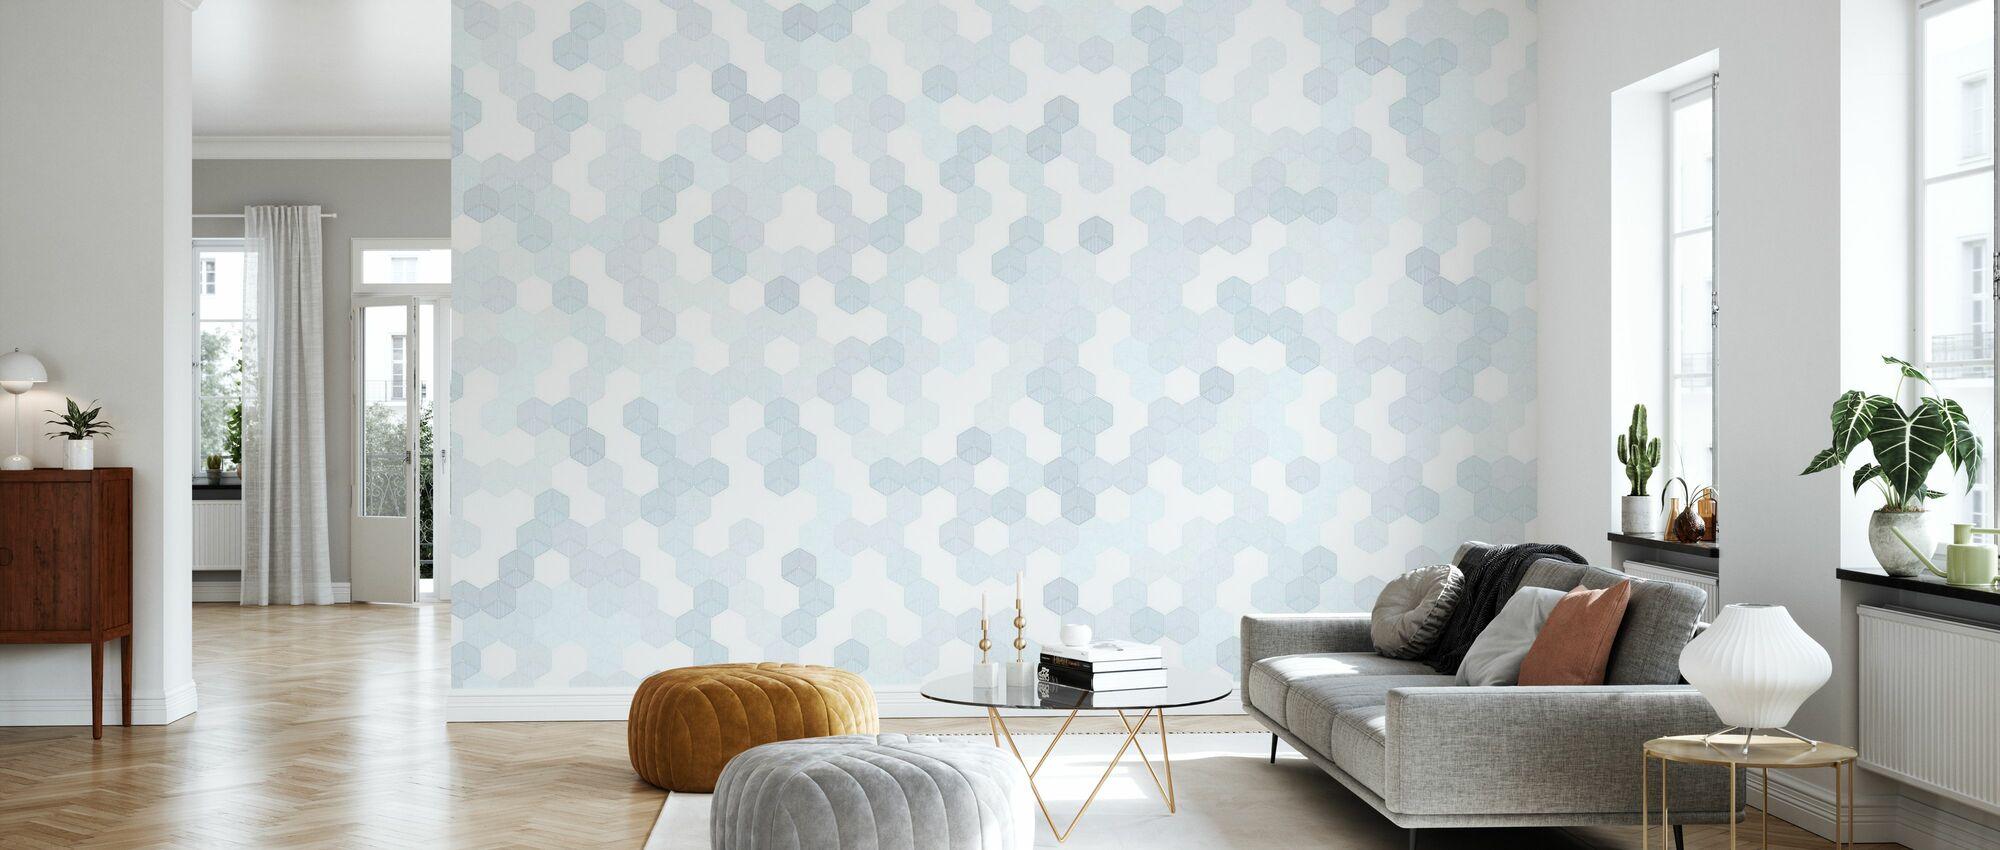 Hexagon - Blue - Wallpaper - Living Room